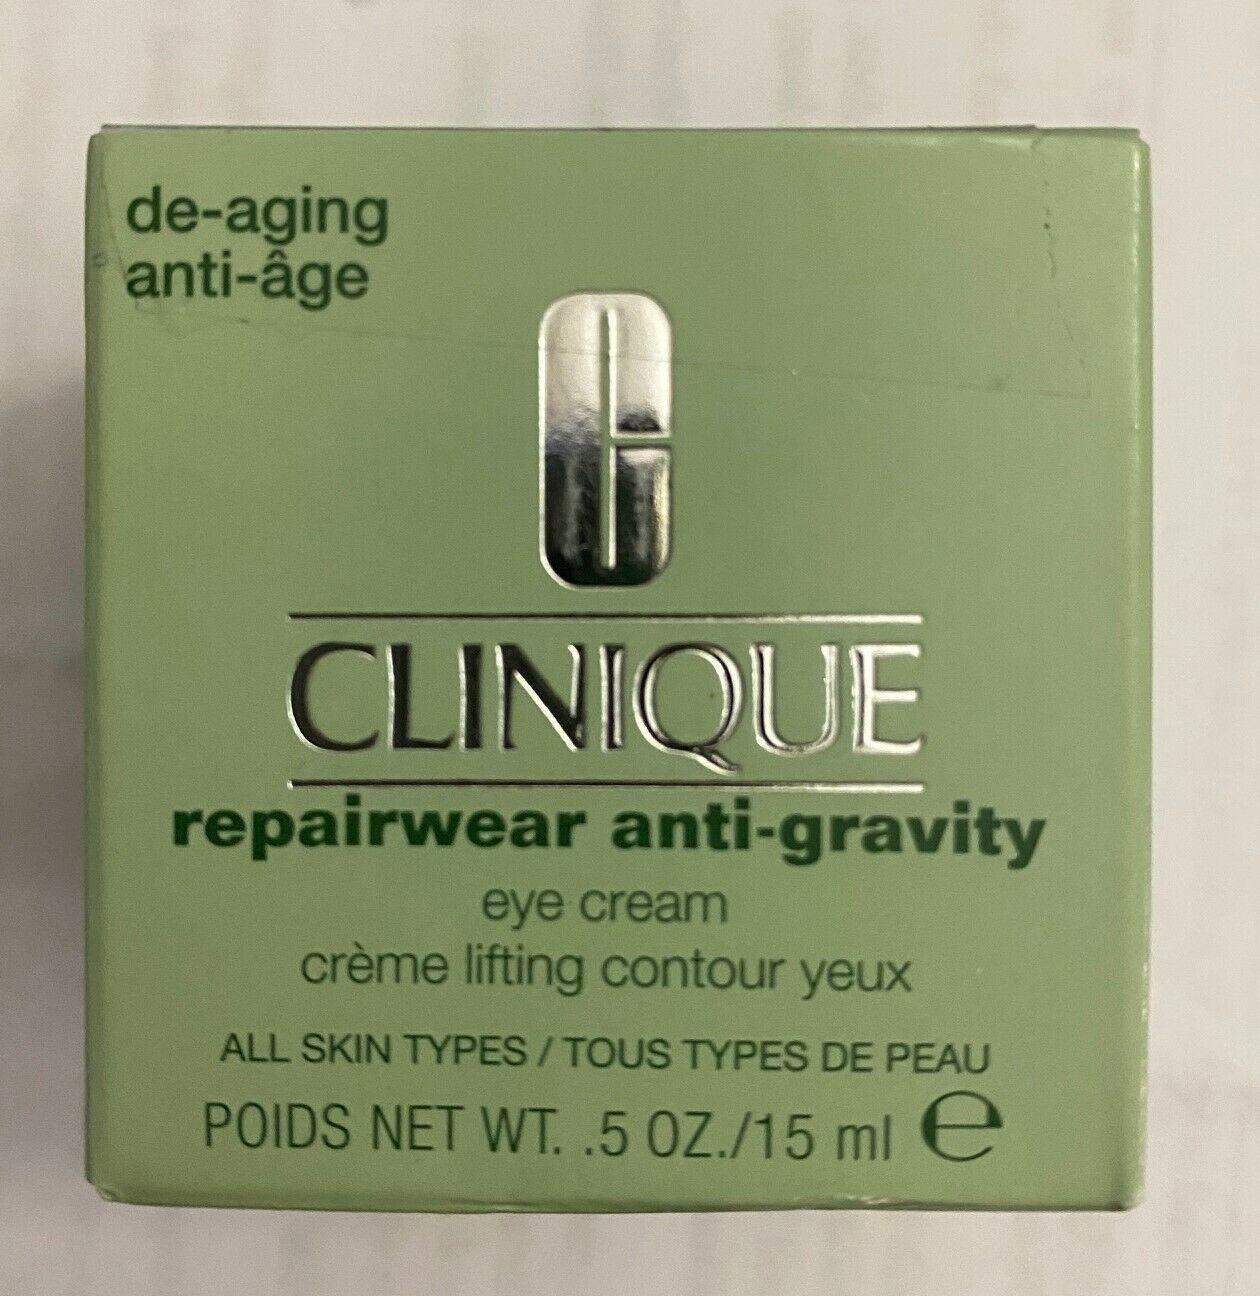 Clinique Repair Wear Laser Focus Wrinkle Correcting Eye Crea